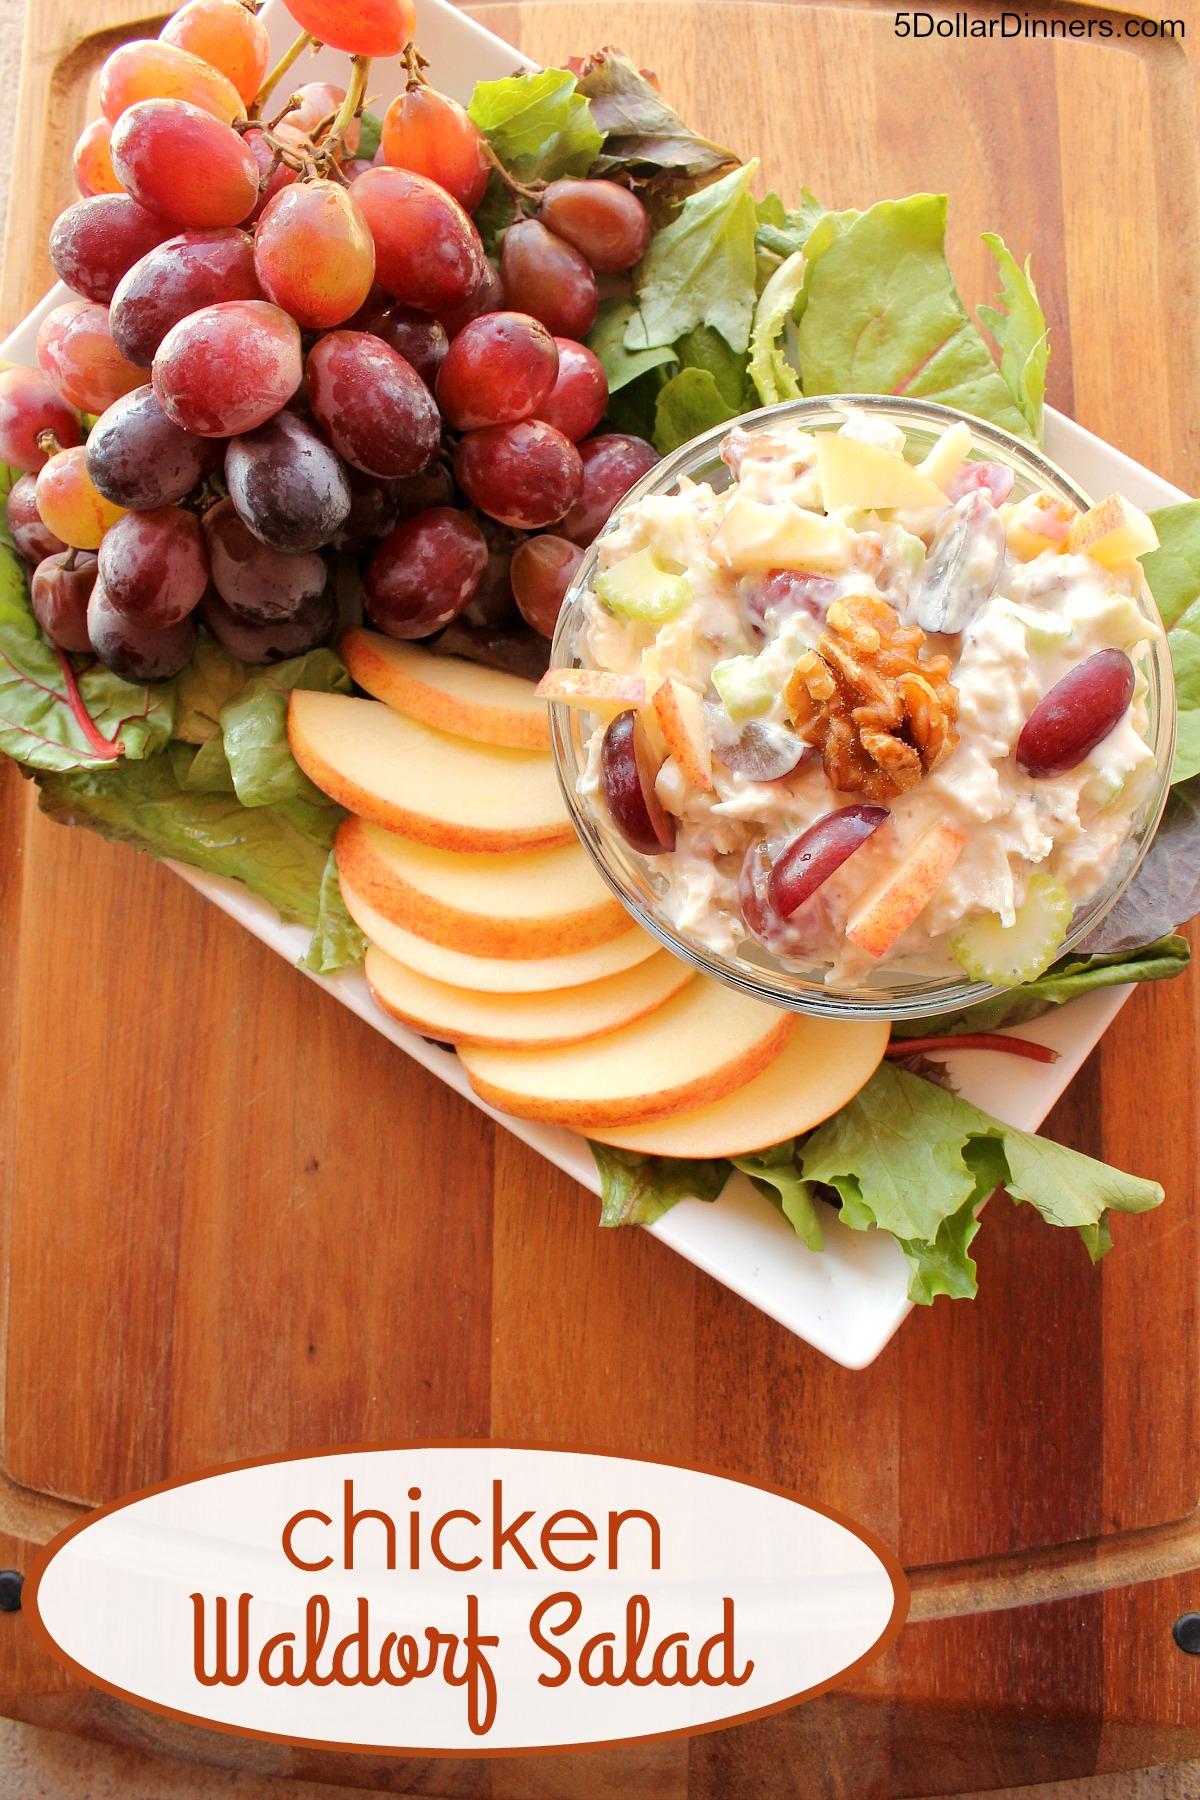 Chicken Waldorf Salad from 5DollarDinners.com